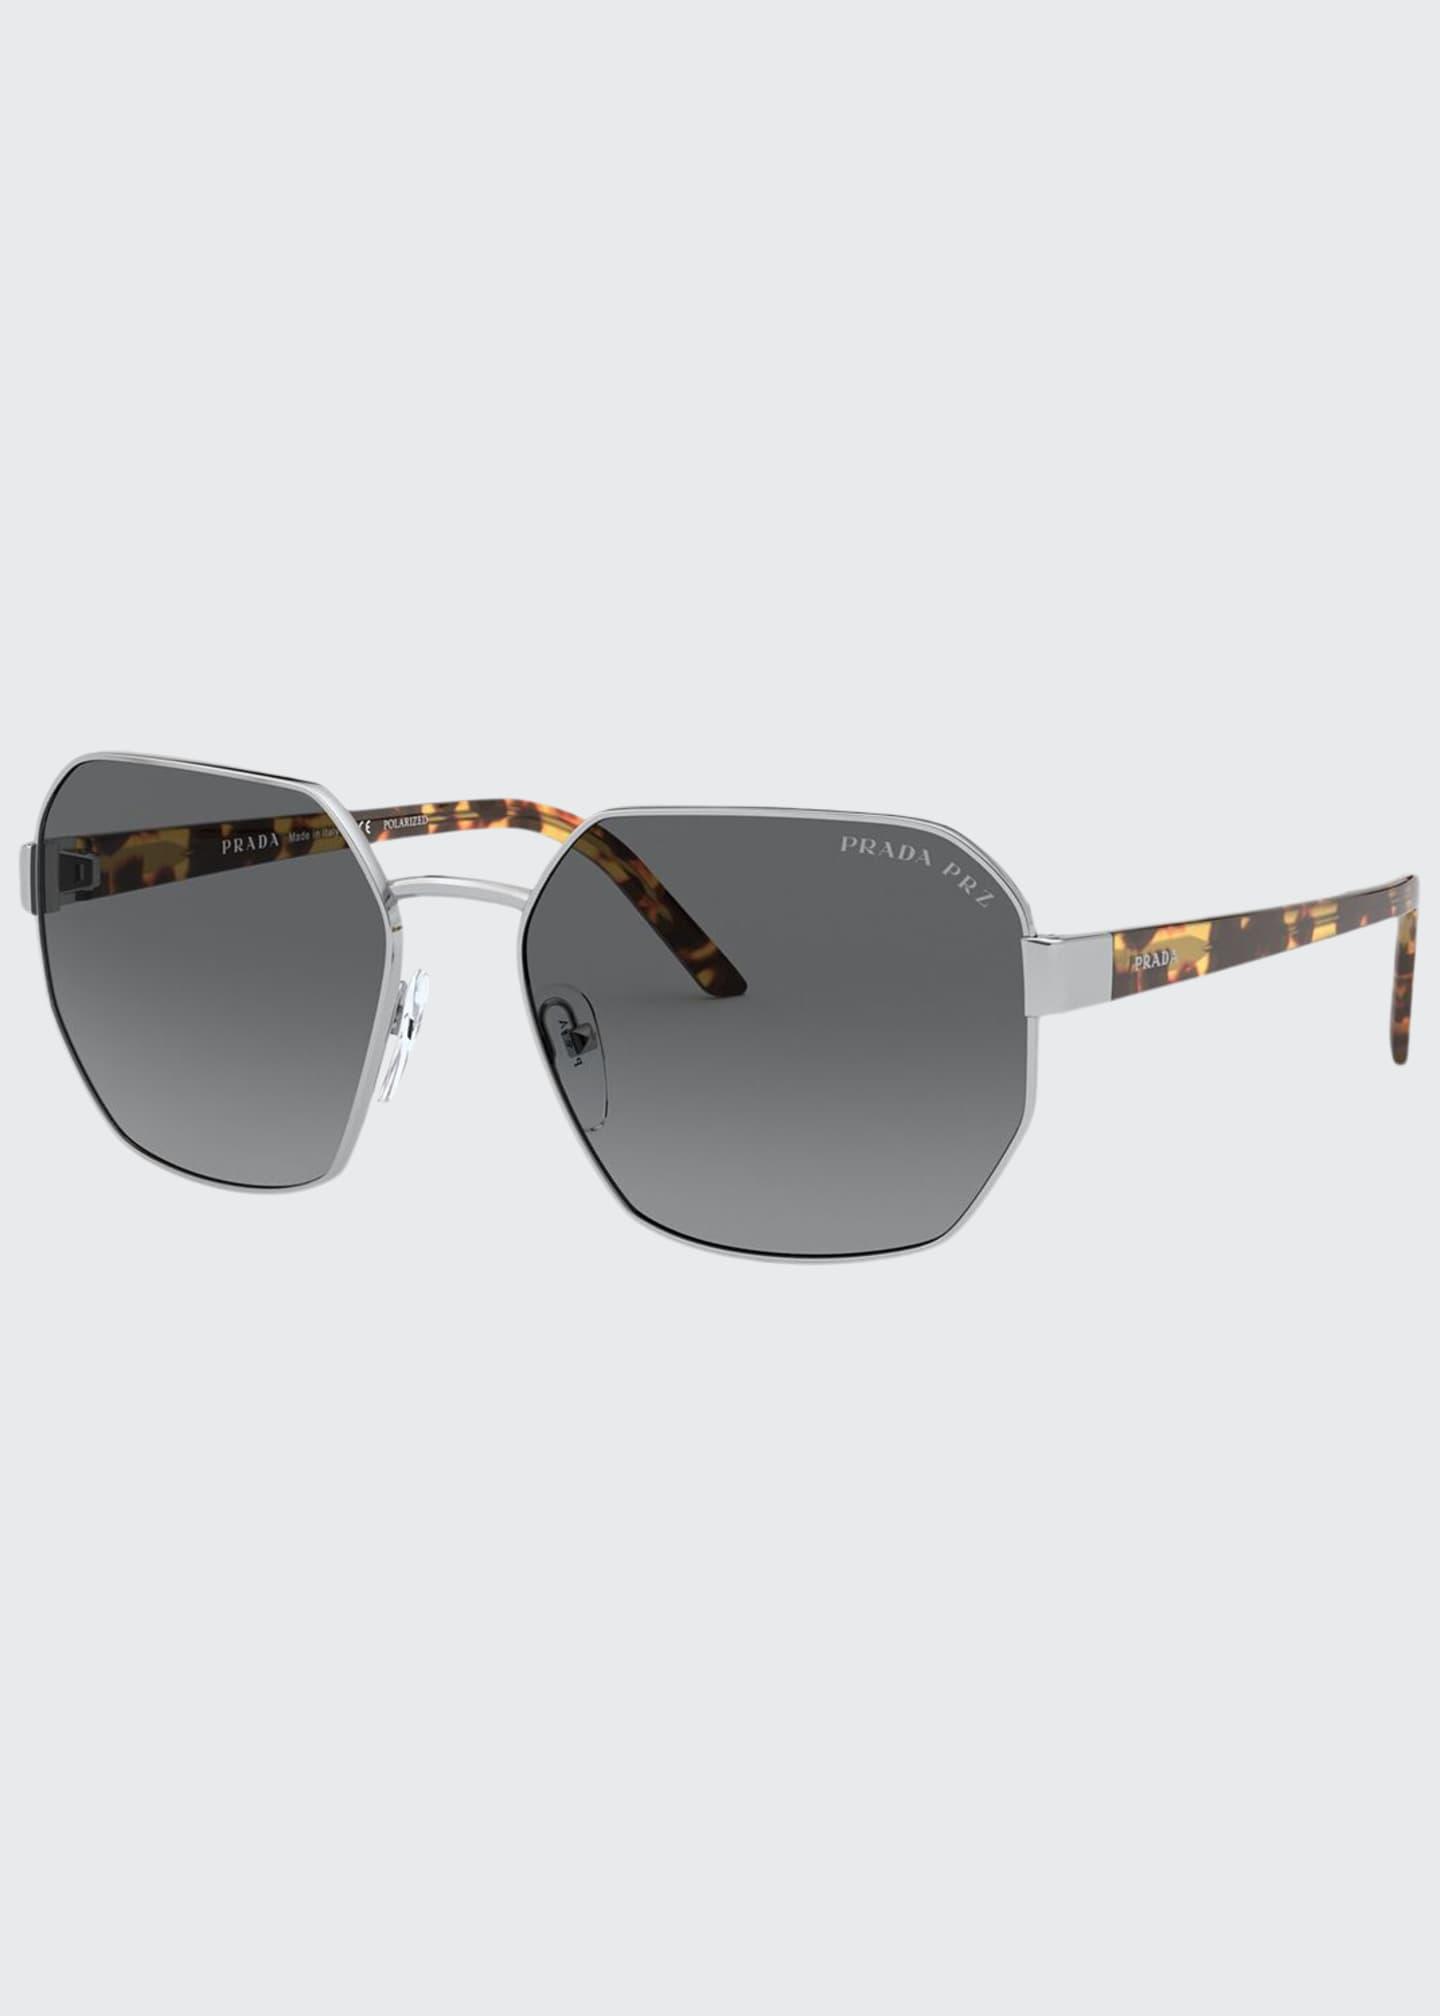 Prada Square Metal Polarized Sunglasses